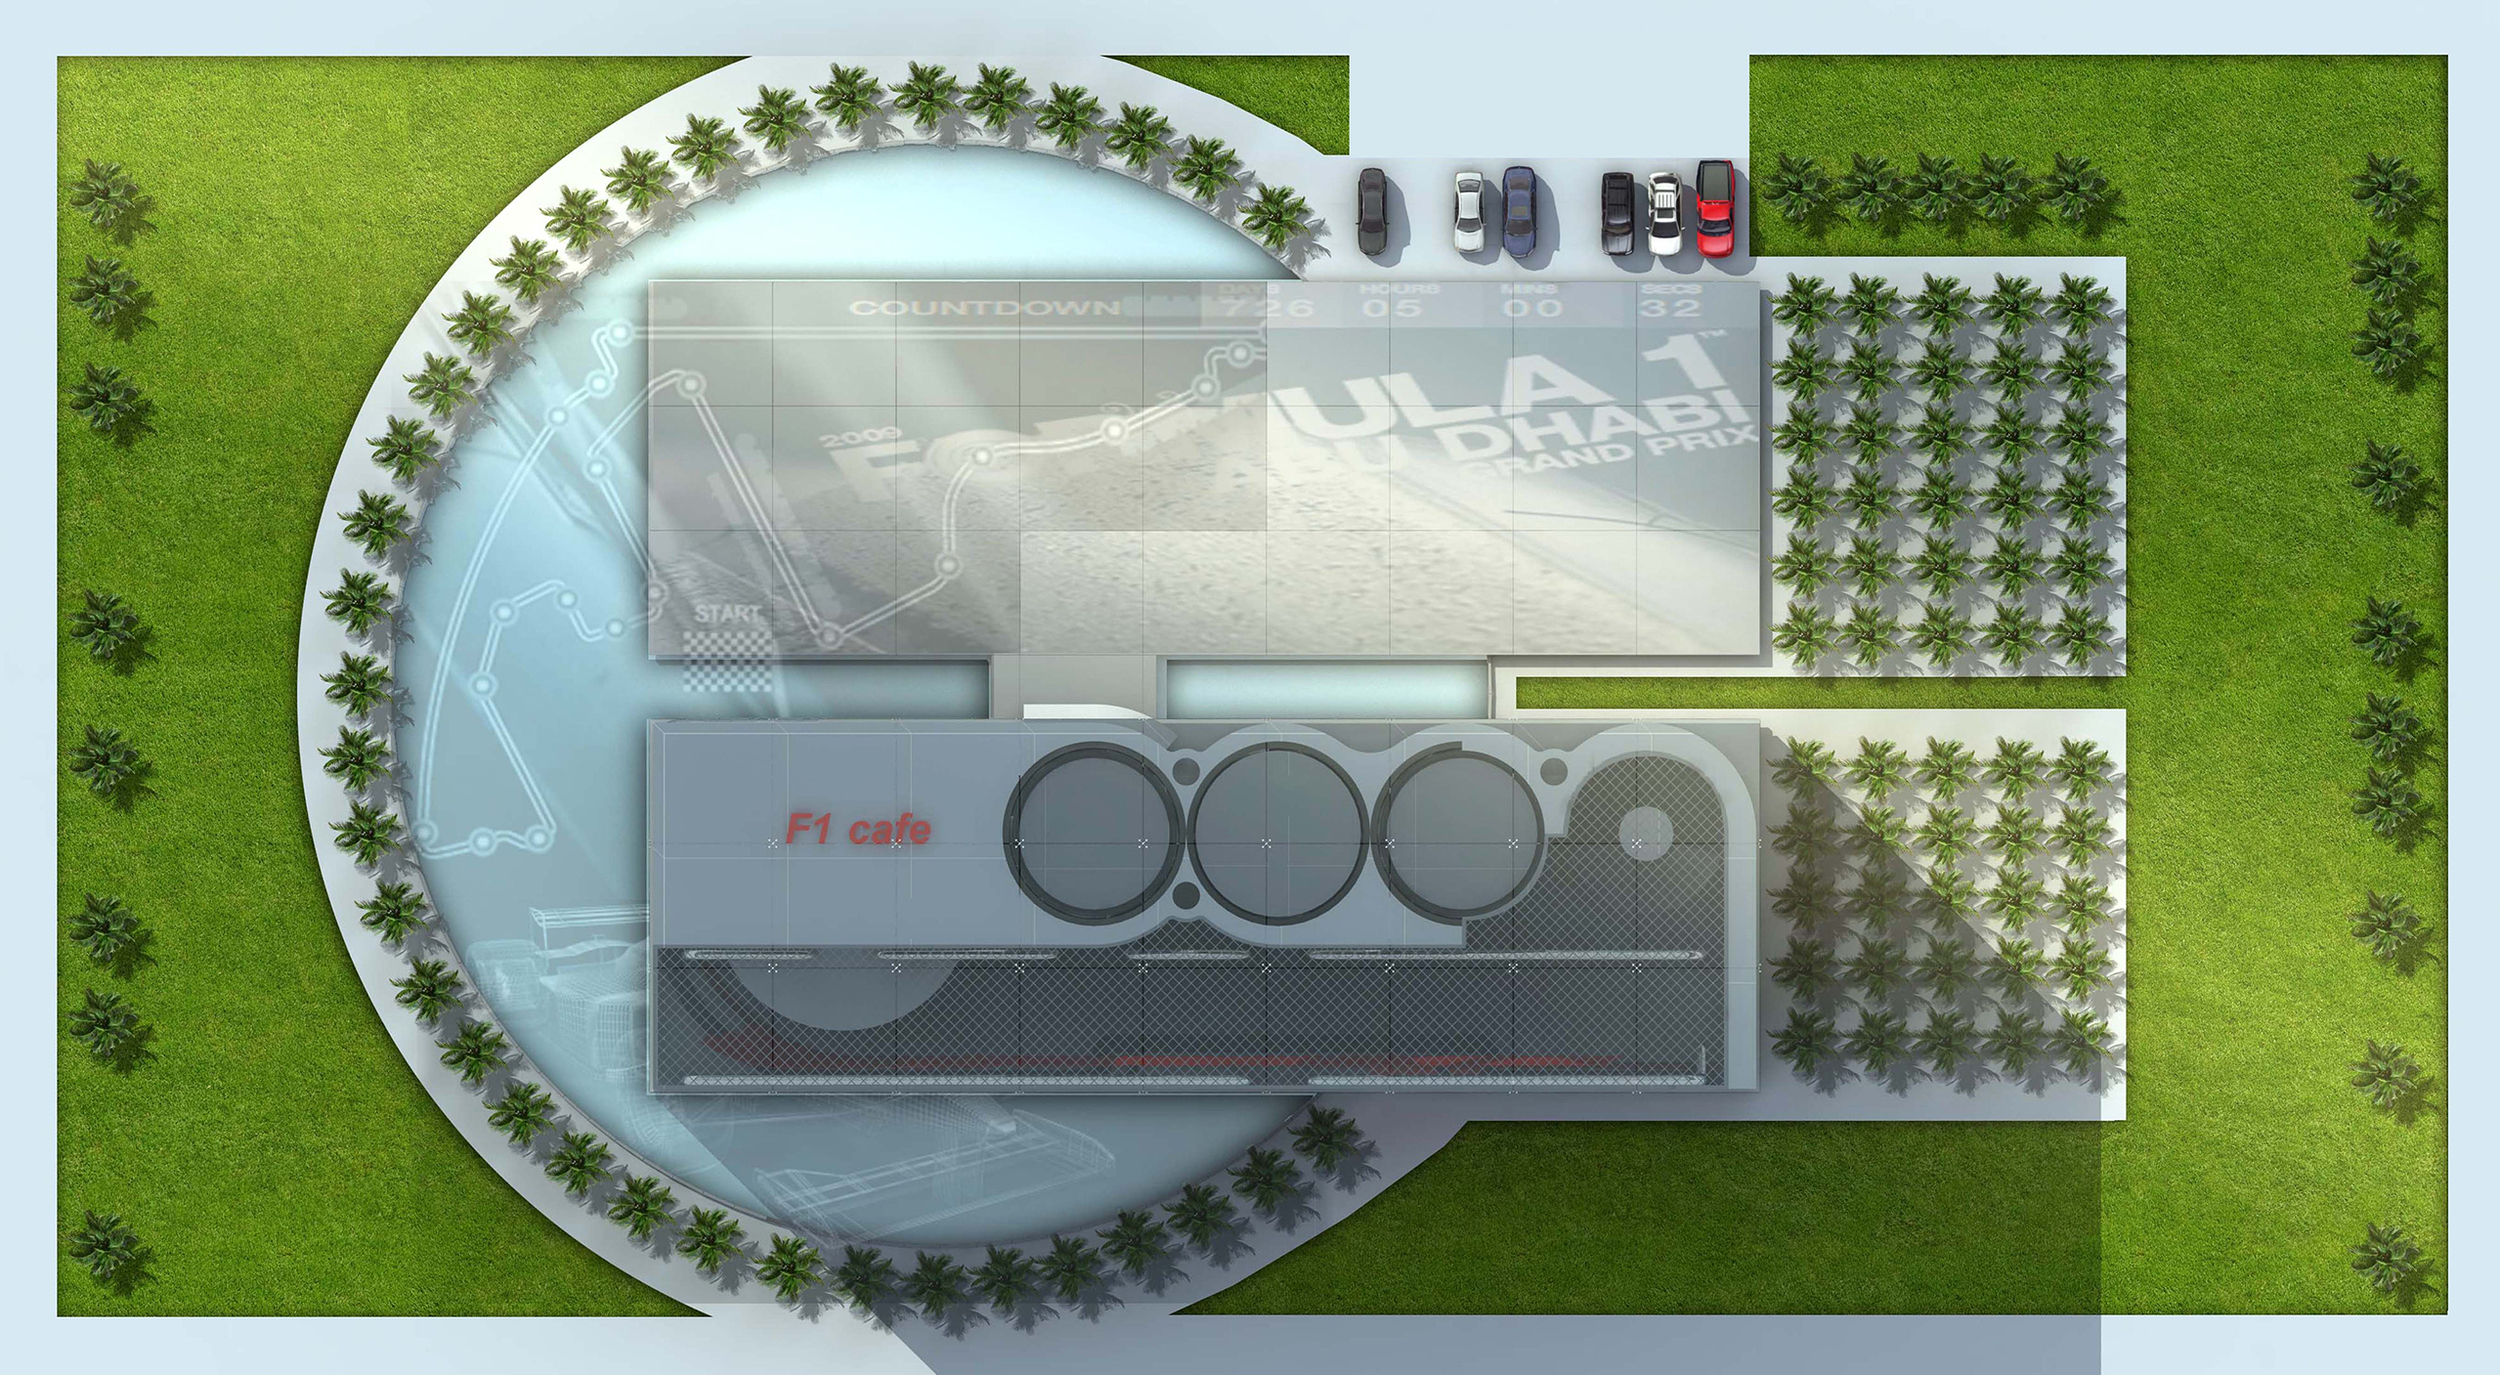 BEAD F1 Cafe Abu Dhabi UAE plan.JPG